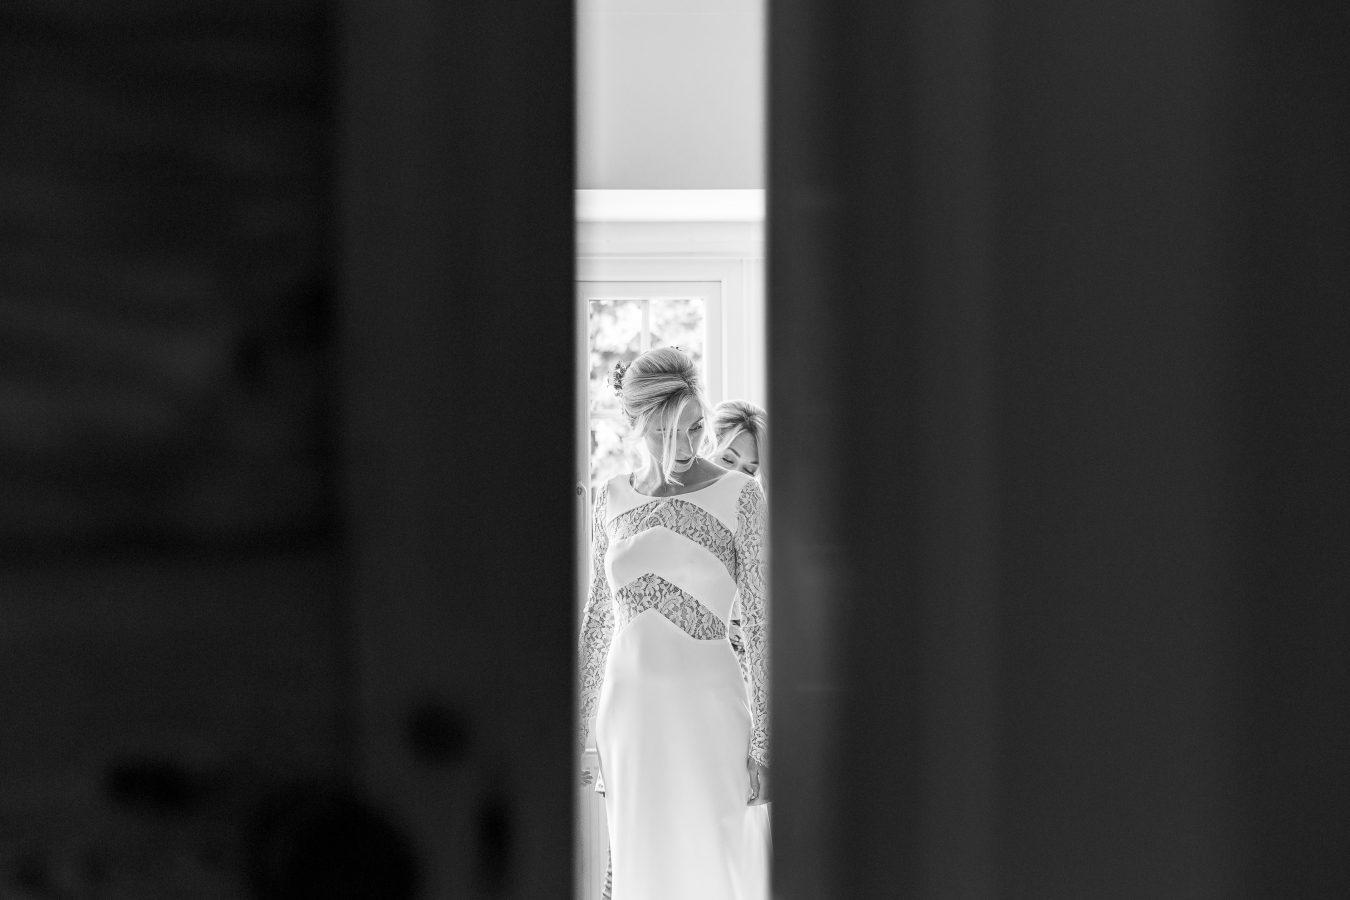 Sarah-Seamy-Jules-Barron-Alternative-Wedding-Venue-2018-72